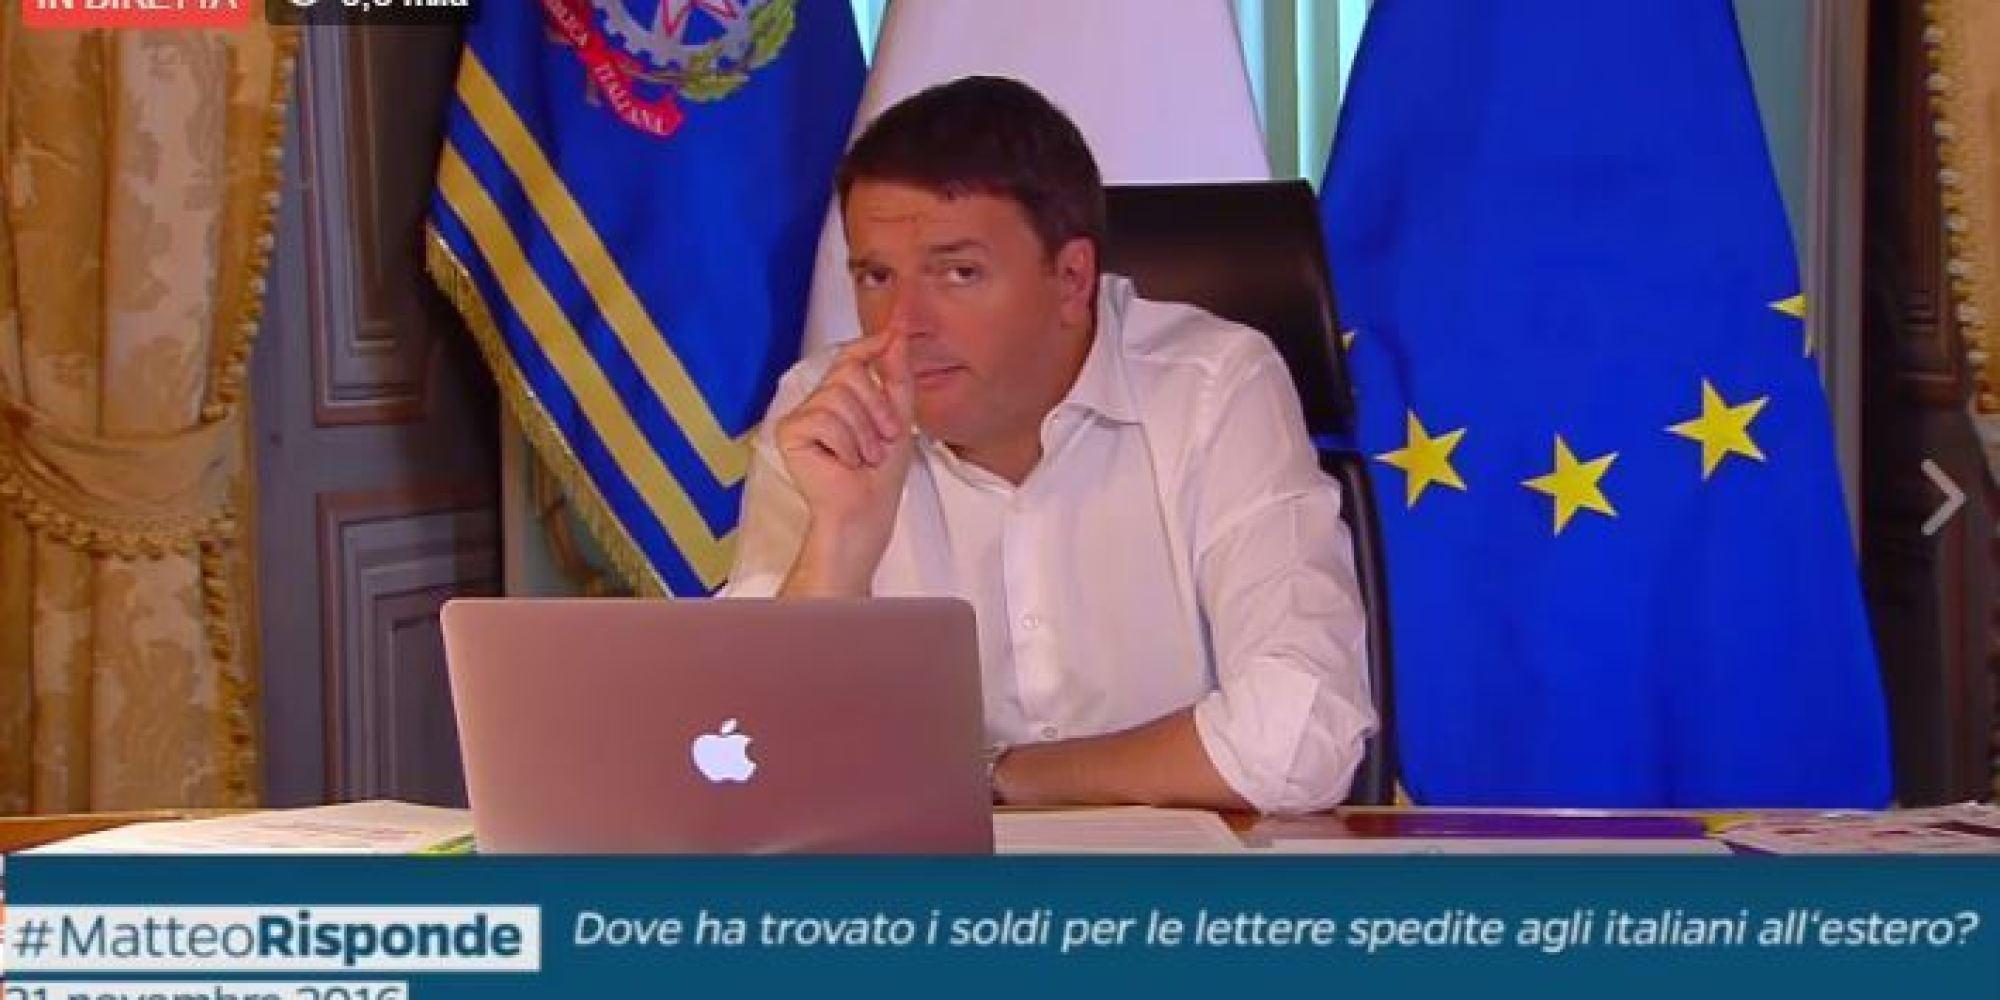 Referendum, al Matteo Risponde dietro Renzi torna la bandiera Ue ...